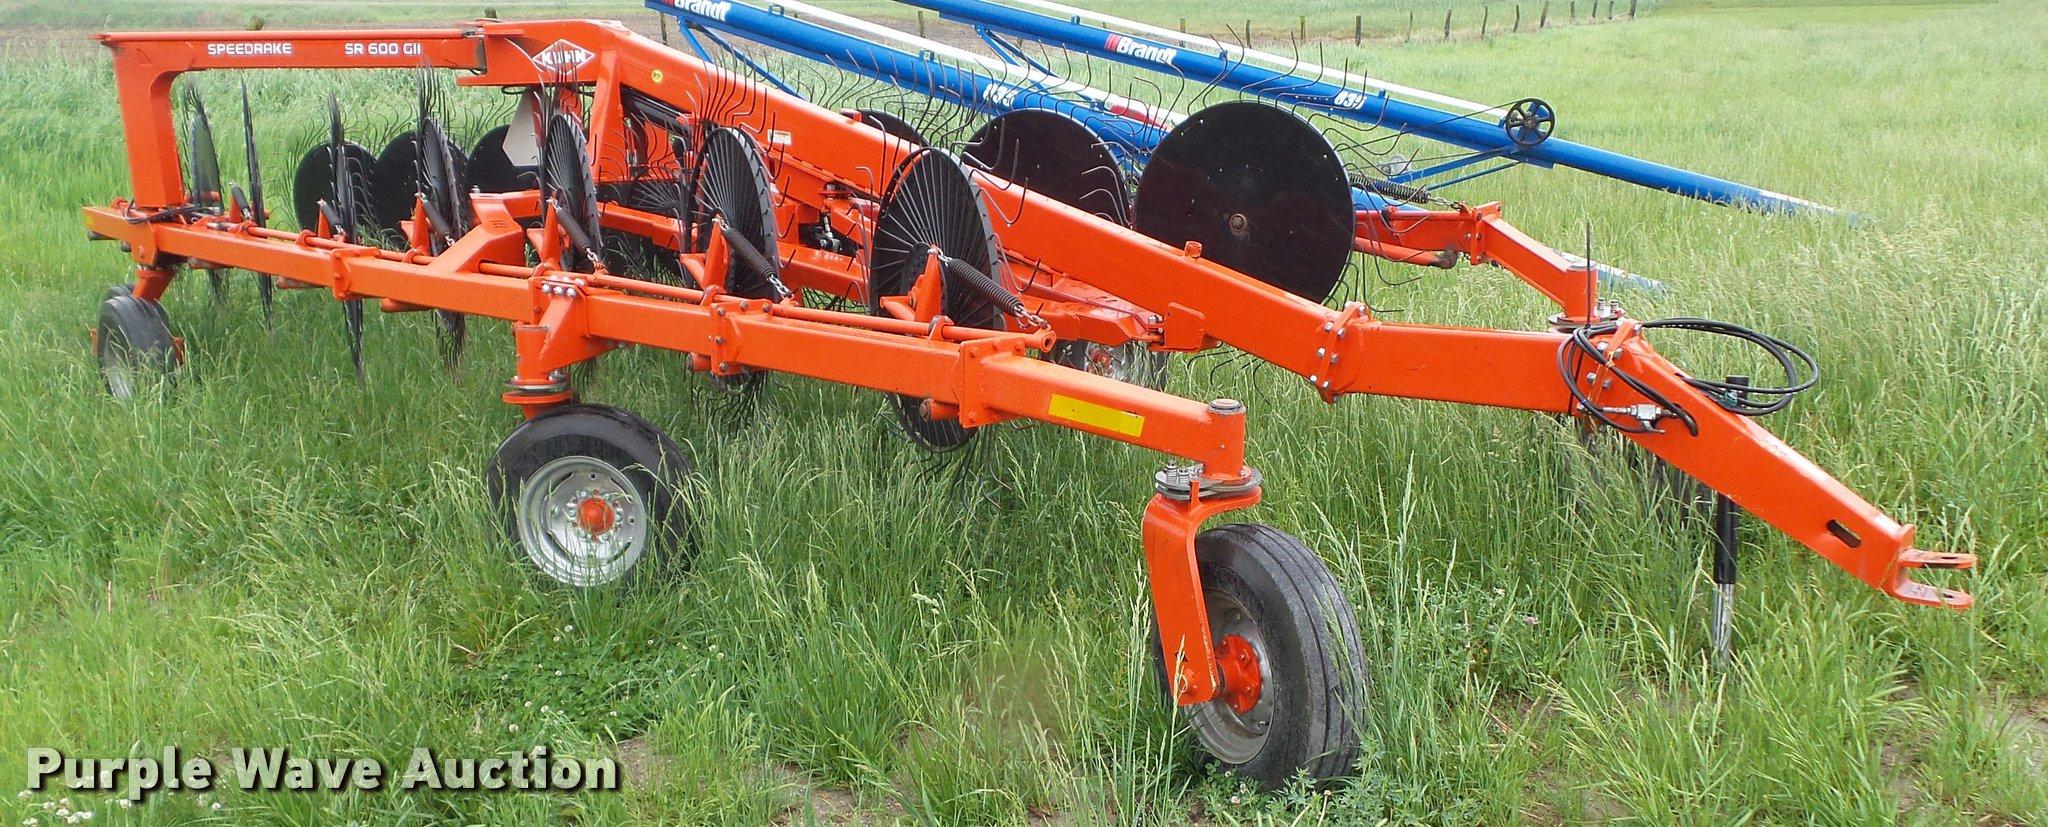 2013 Kuhn SR600 G11 speed rake | Item L5595 | SOLD! June 14